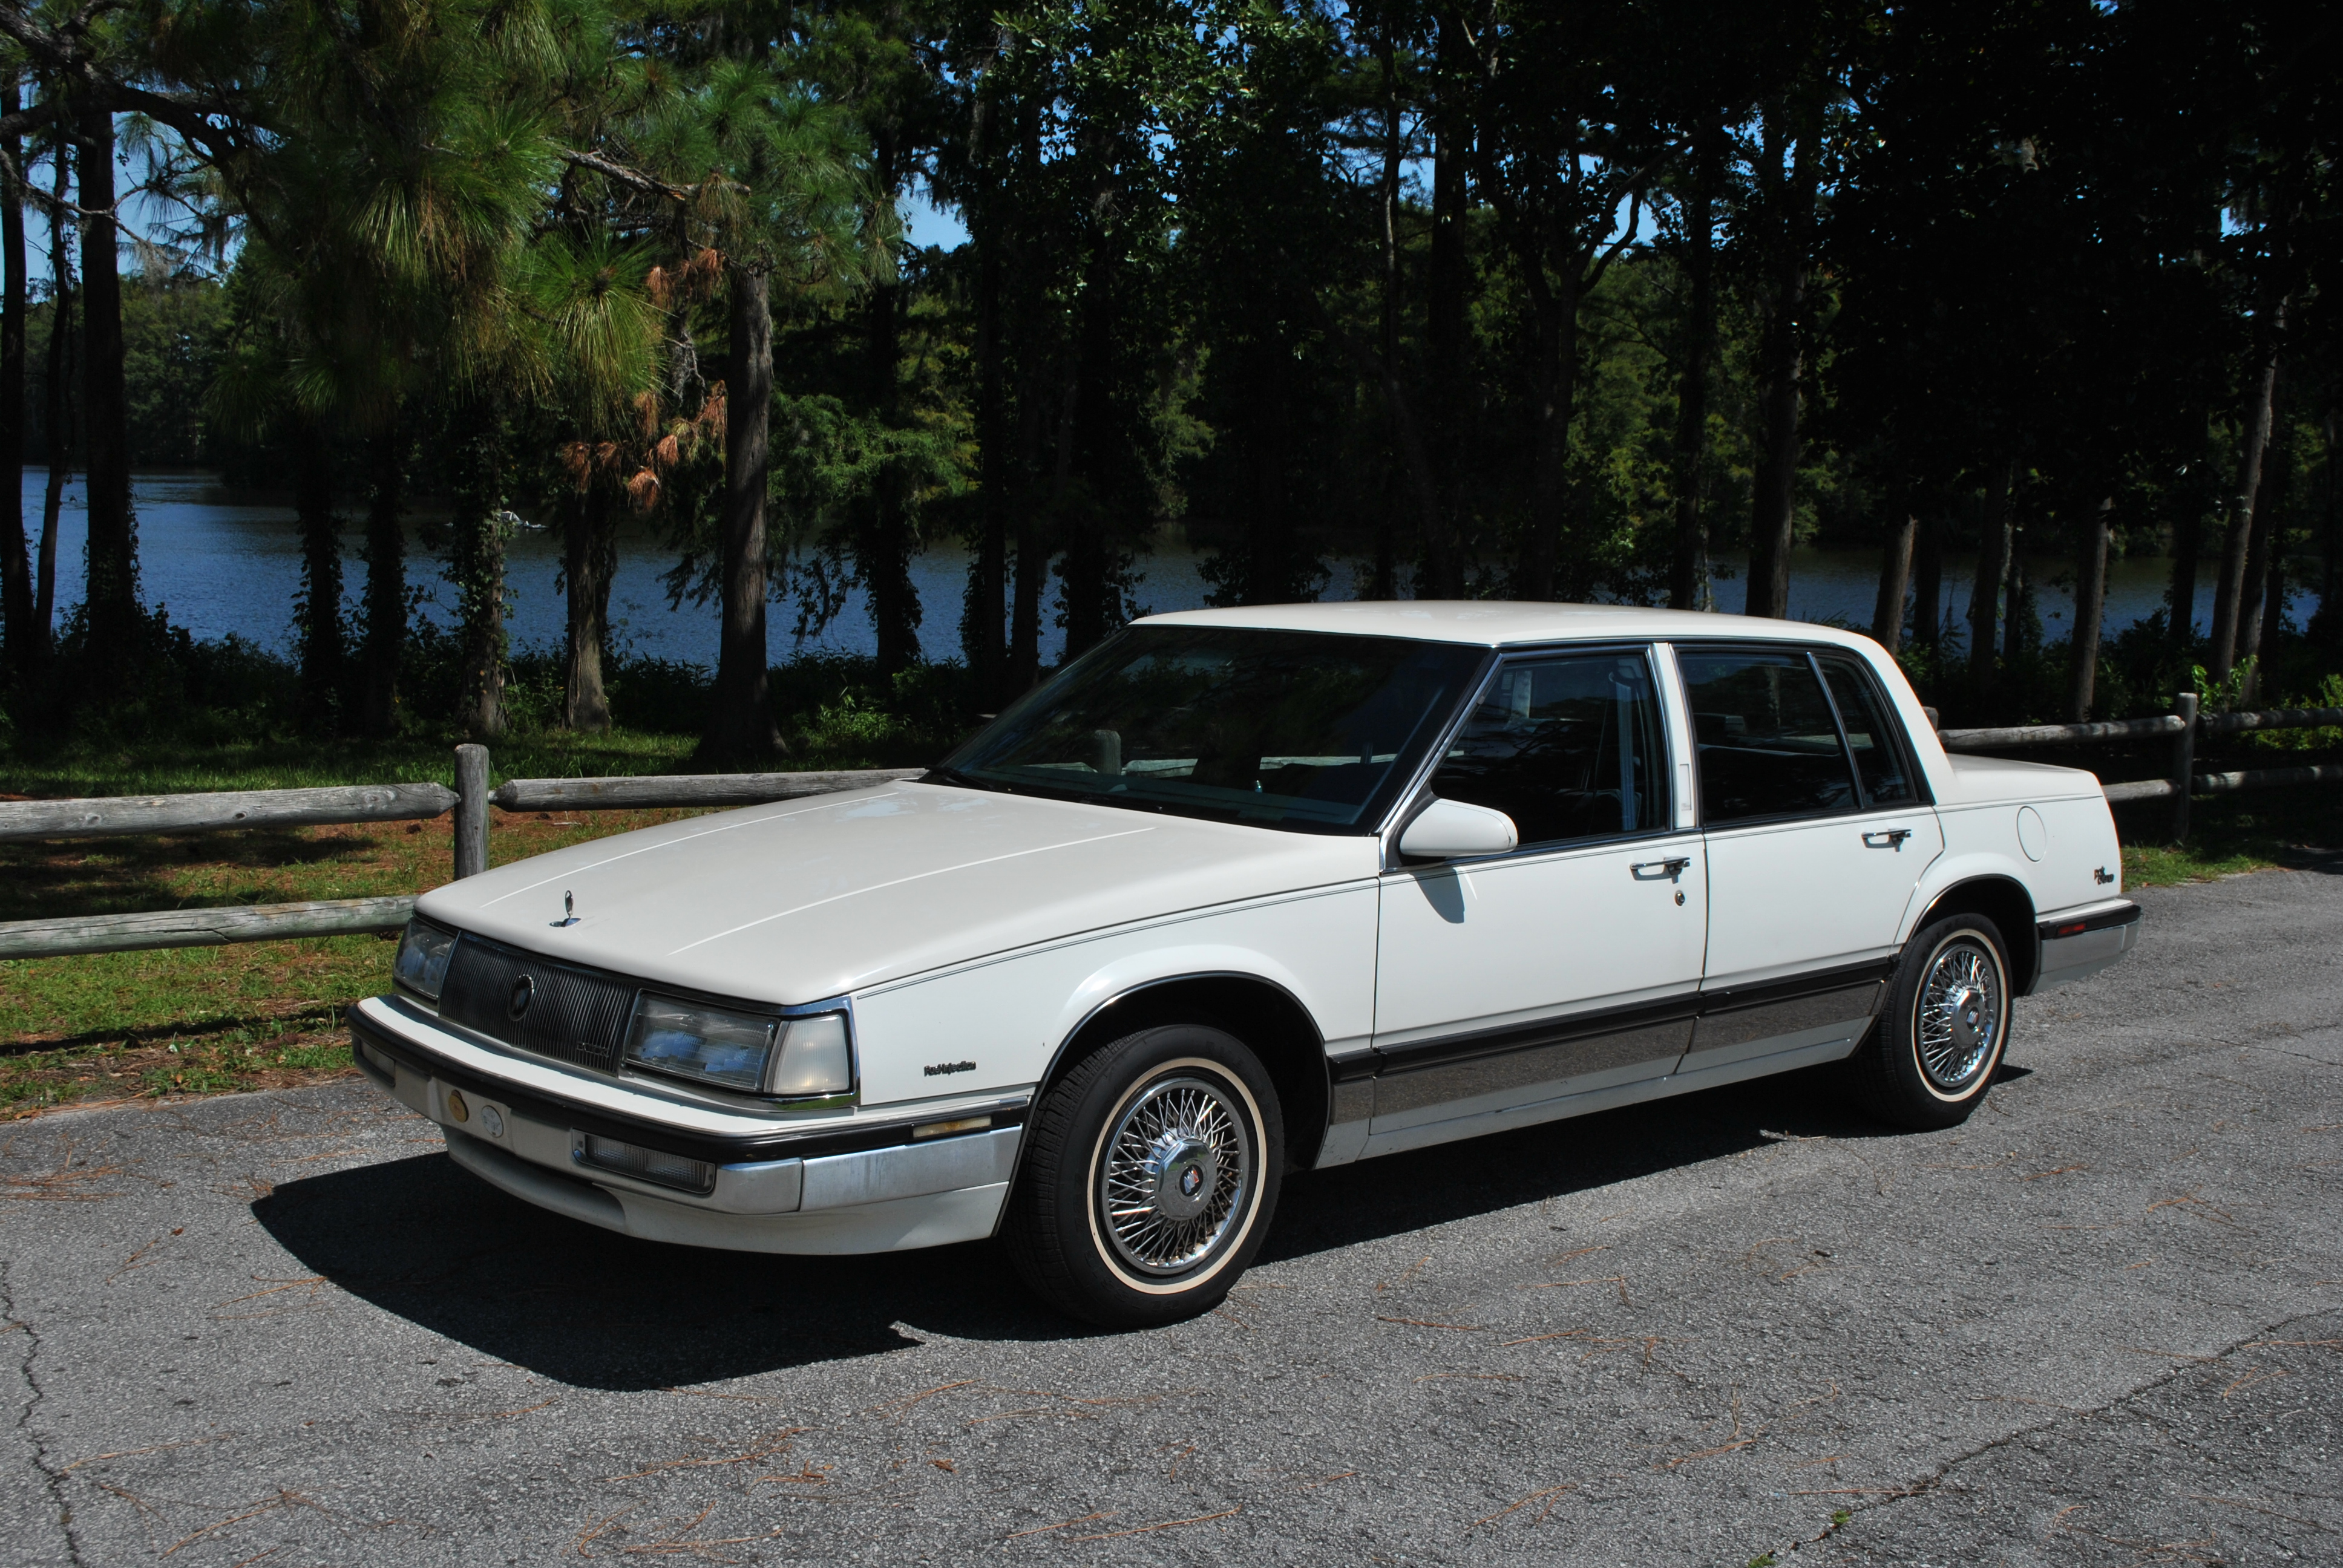 sold 1989 buick electra park avenue 4 door sedan aaca original